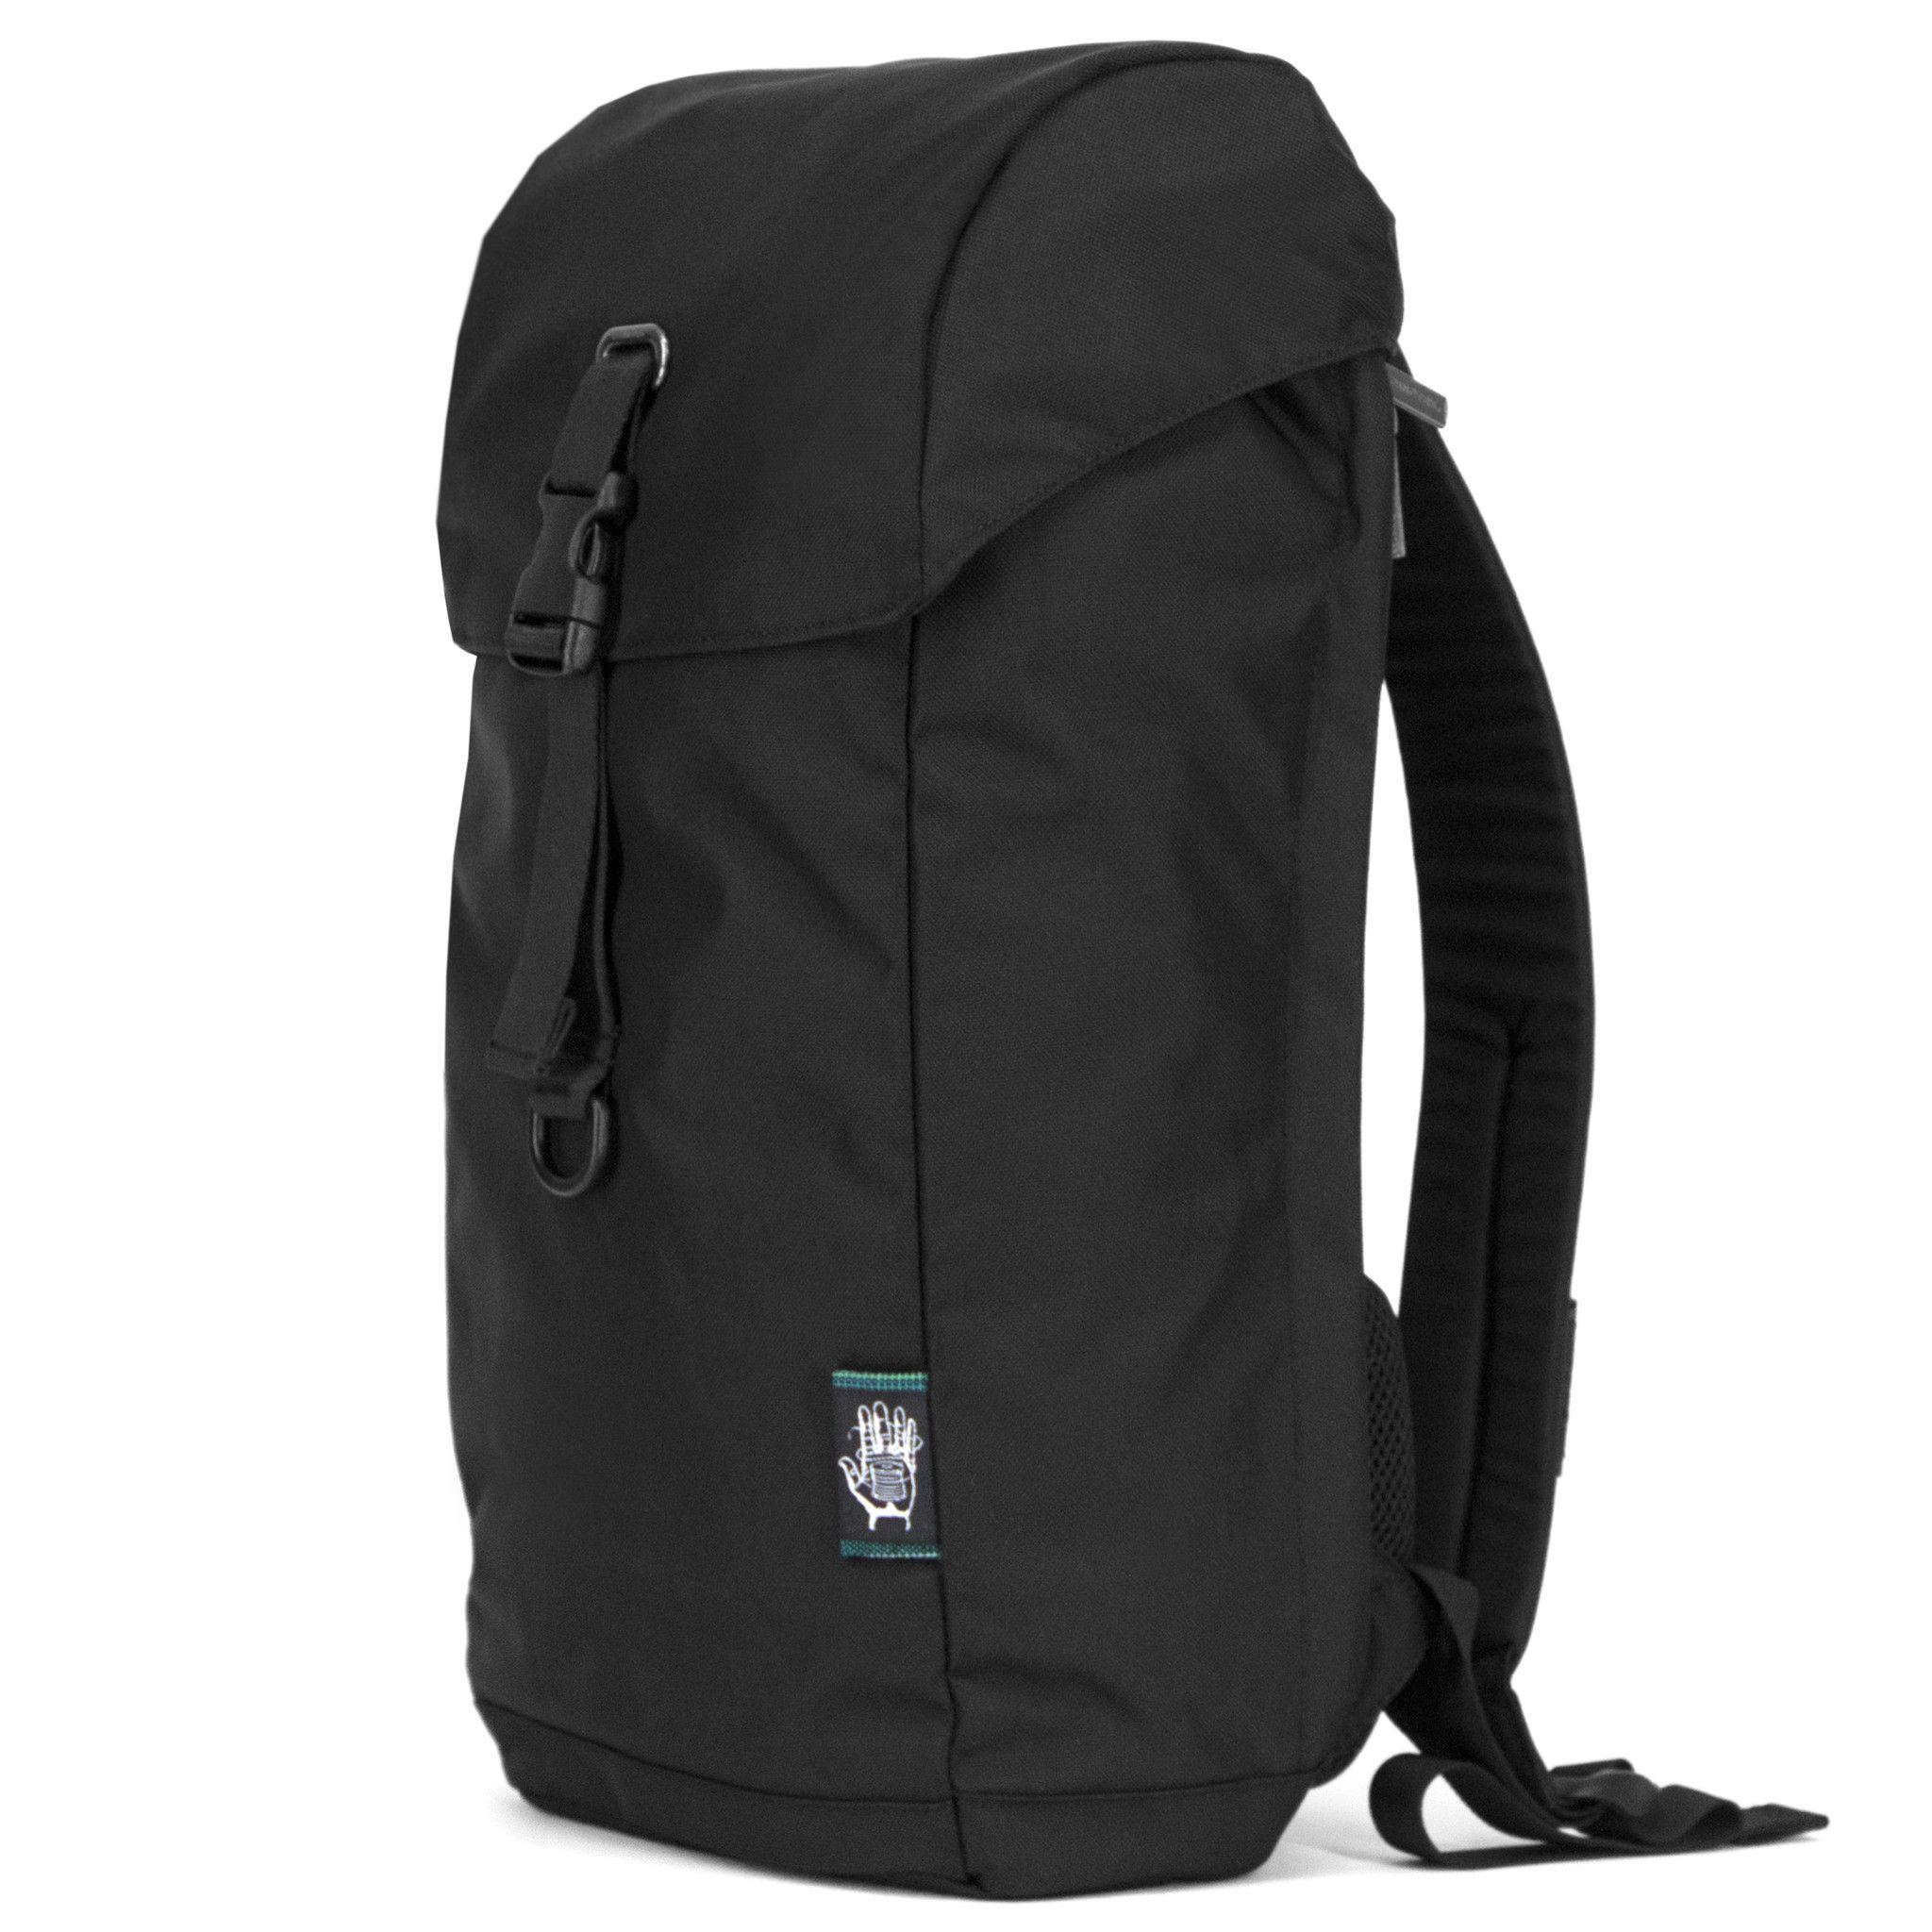 Ethnotek | Setia Backpack | Laptop Protection | Best Travel Carry ...